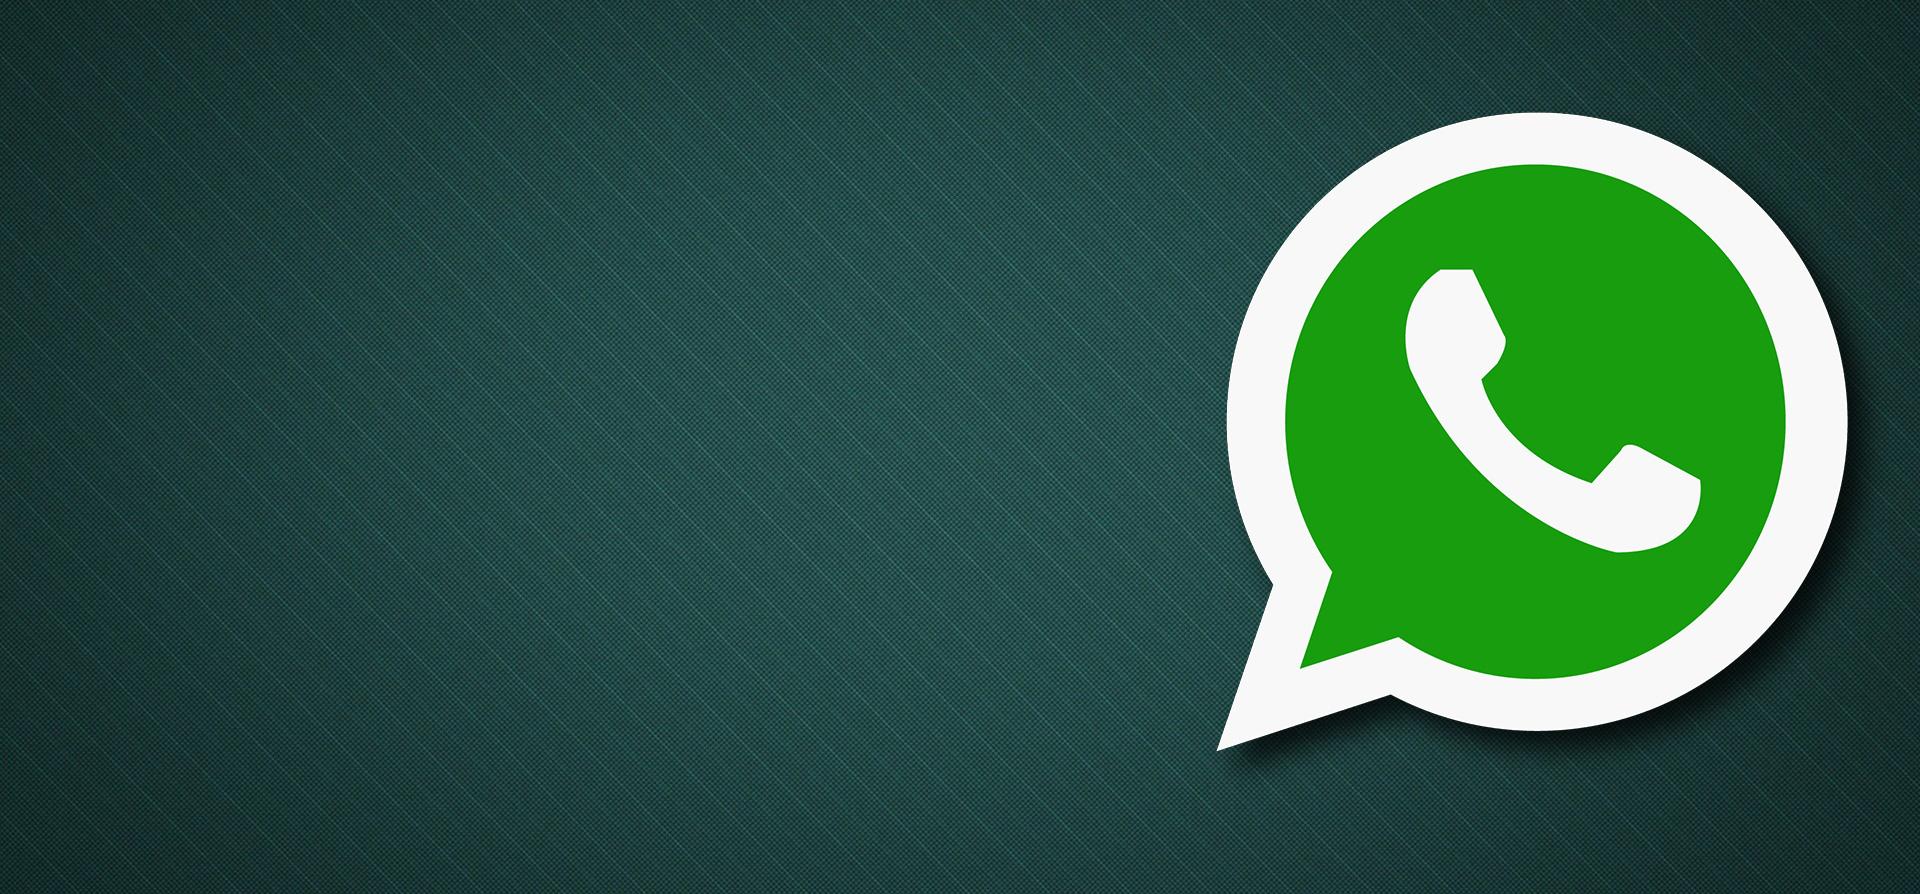 whatsapp e telegram sotto accusa